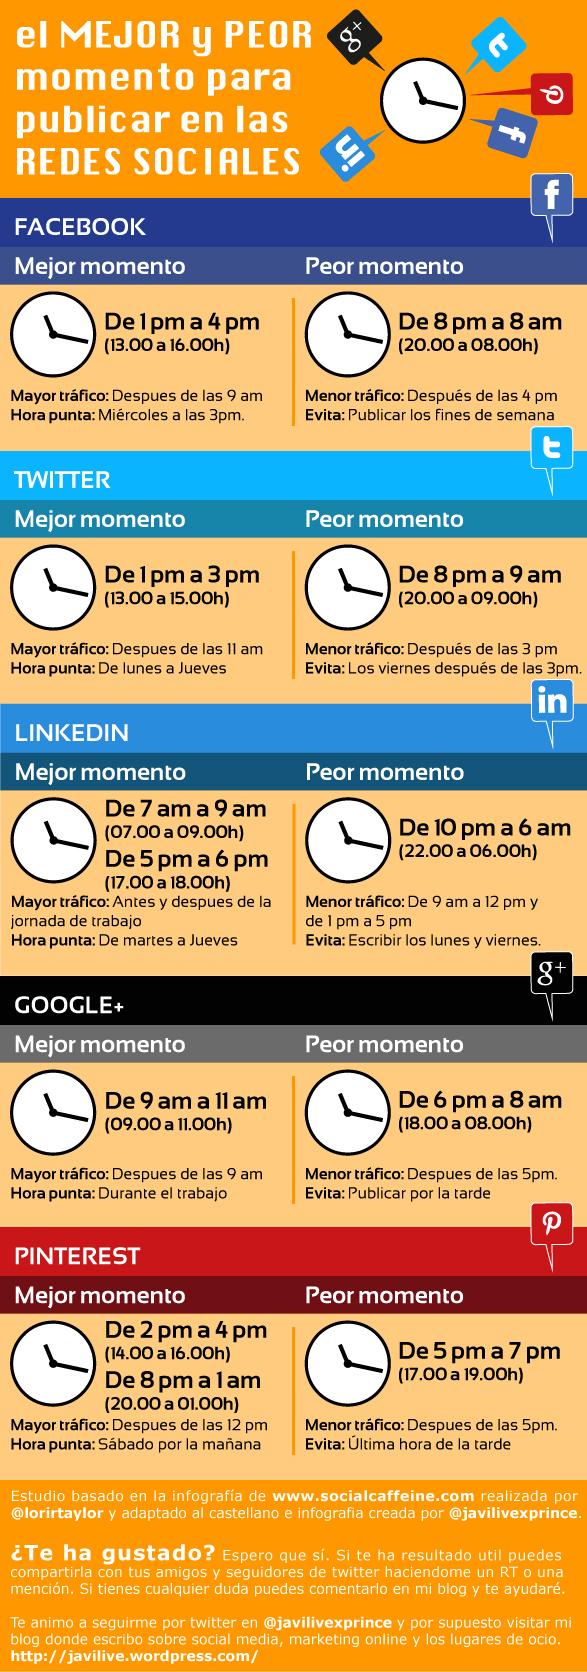 momento_publicar_redessociales